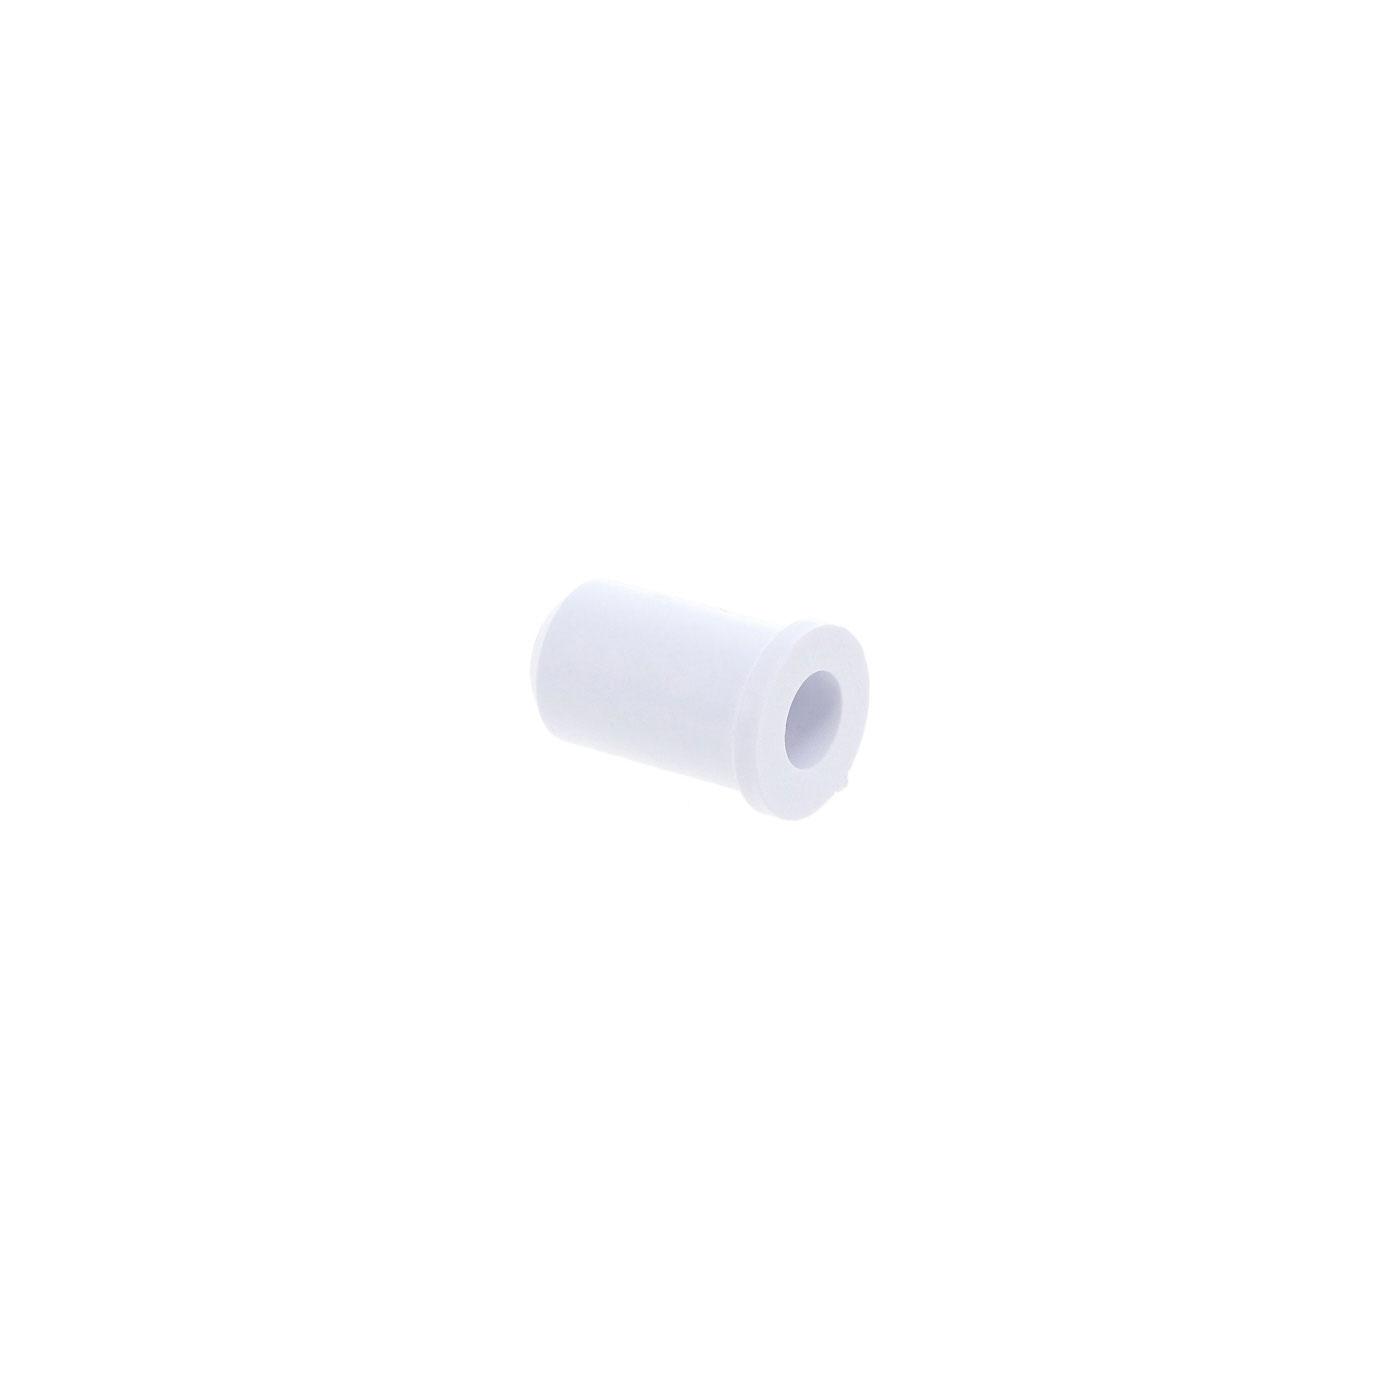 3/8'' M Pipe / Manifold Cap